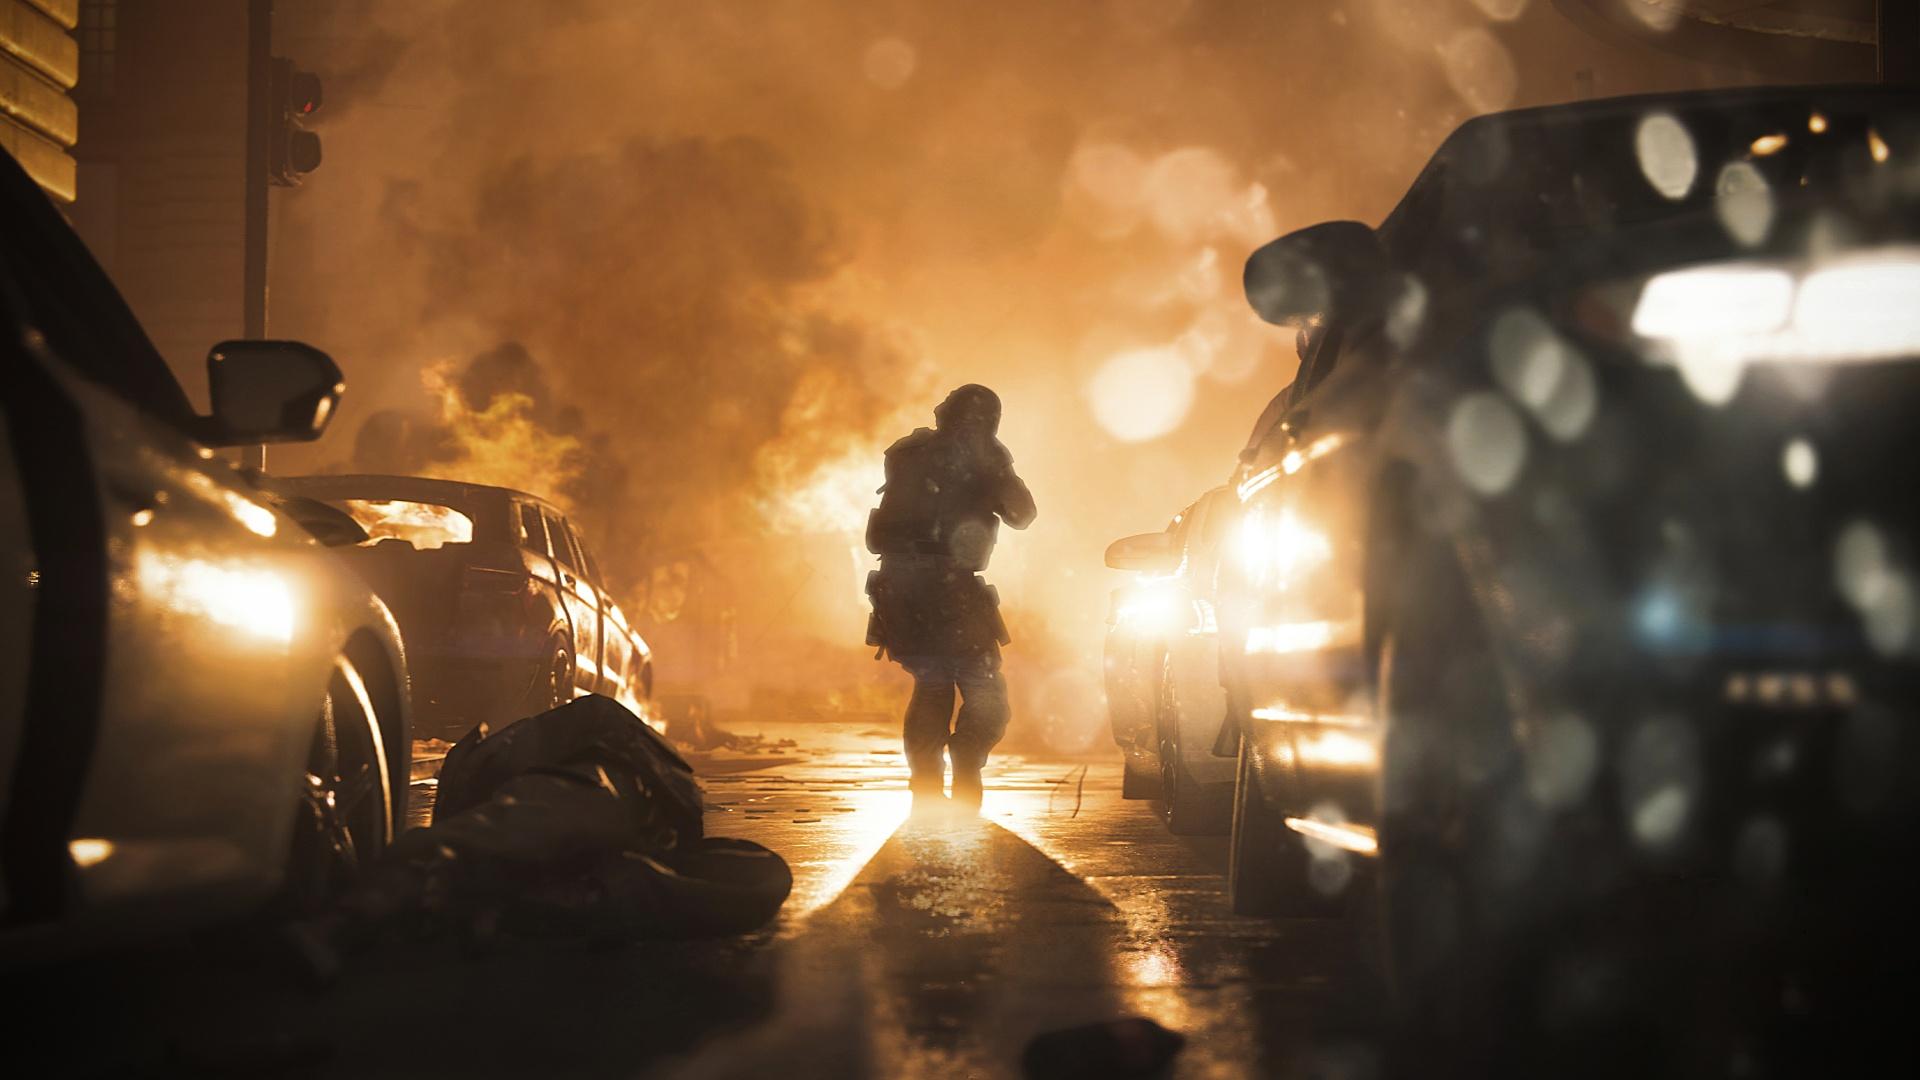 Техподдержка Sony: в России Call of Duty: Modern Warfare не будет продаваться в PS Store